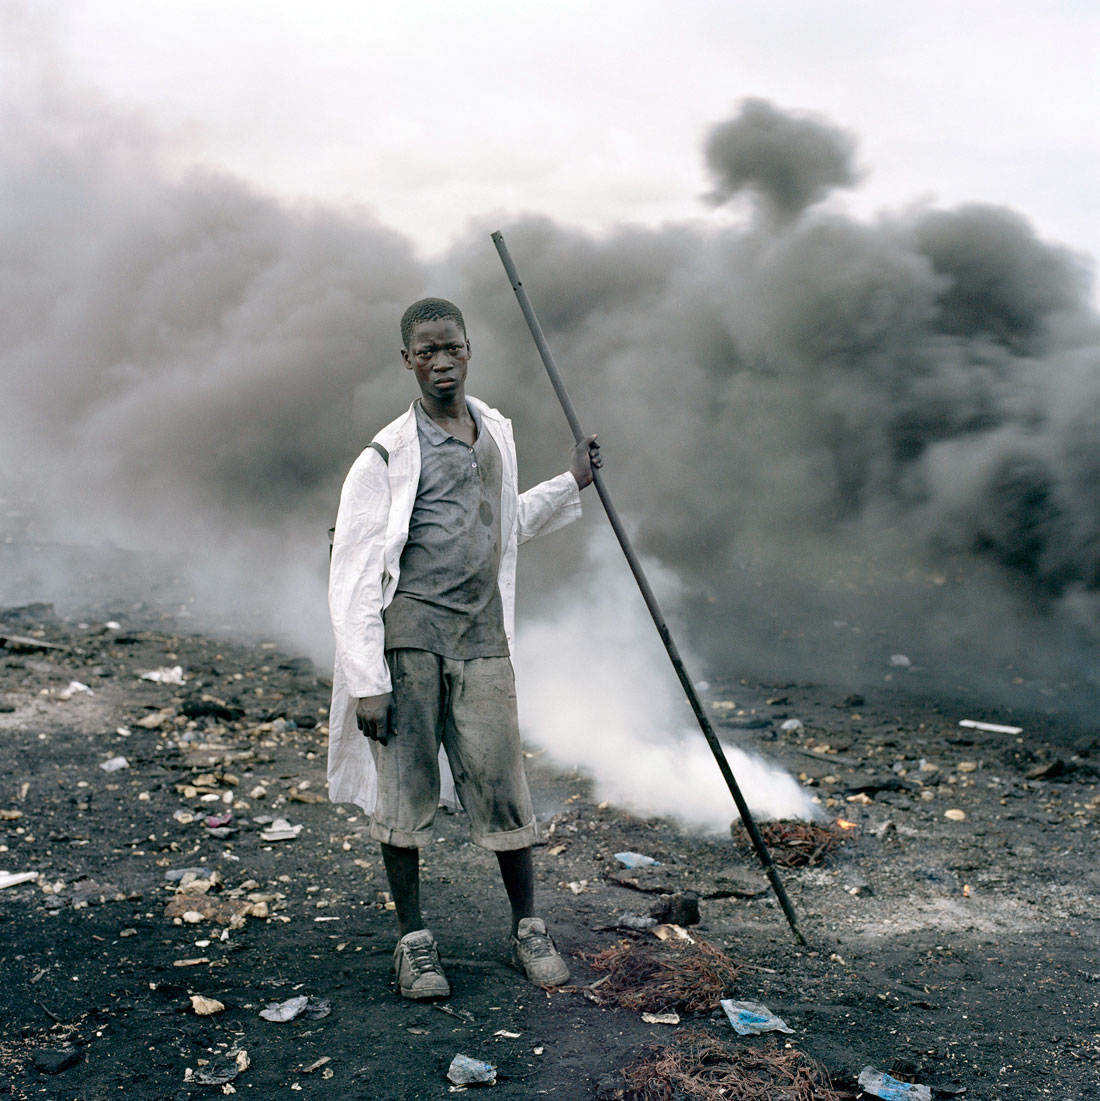 Pieter Hugo. 'Abdulai Yahaya, Agbogbloshie Market, Accra' 2009 - 2010 From the series 'Permanent Error'